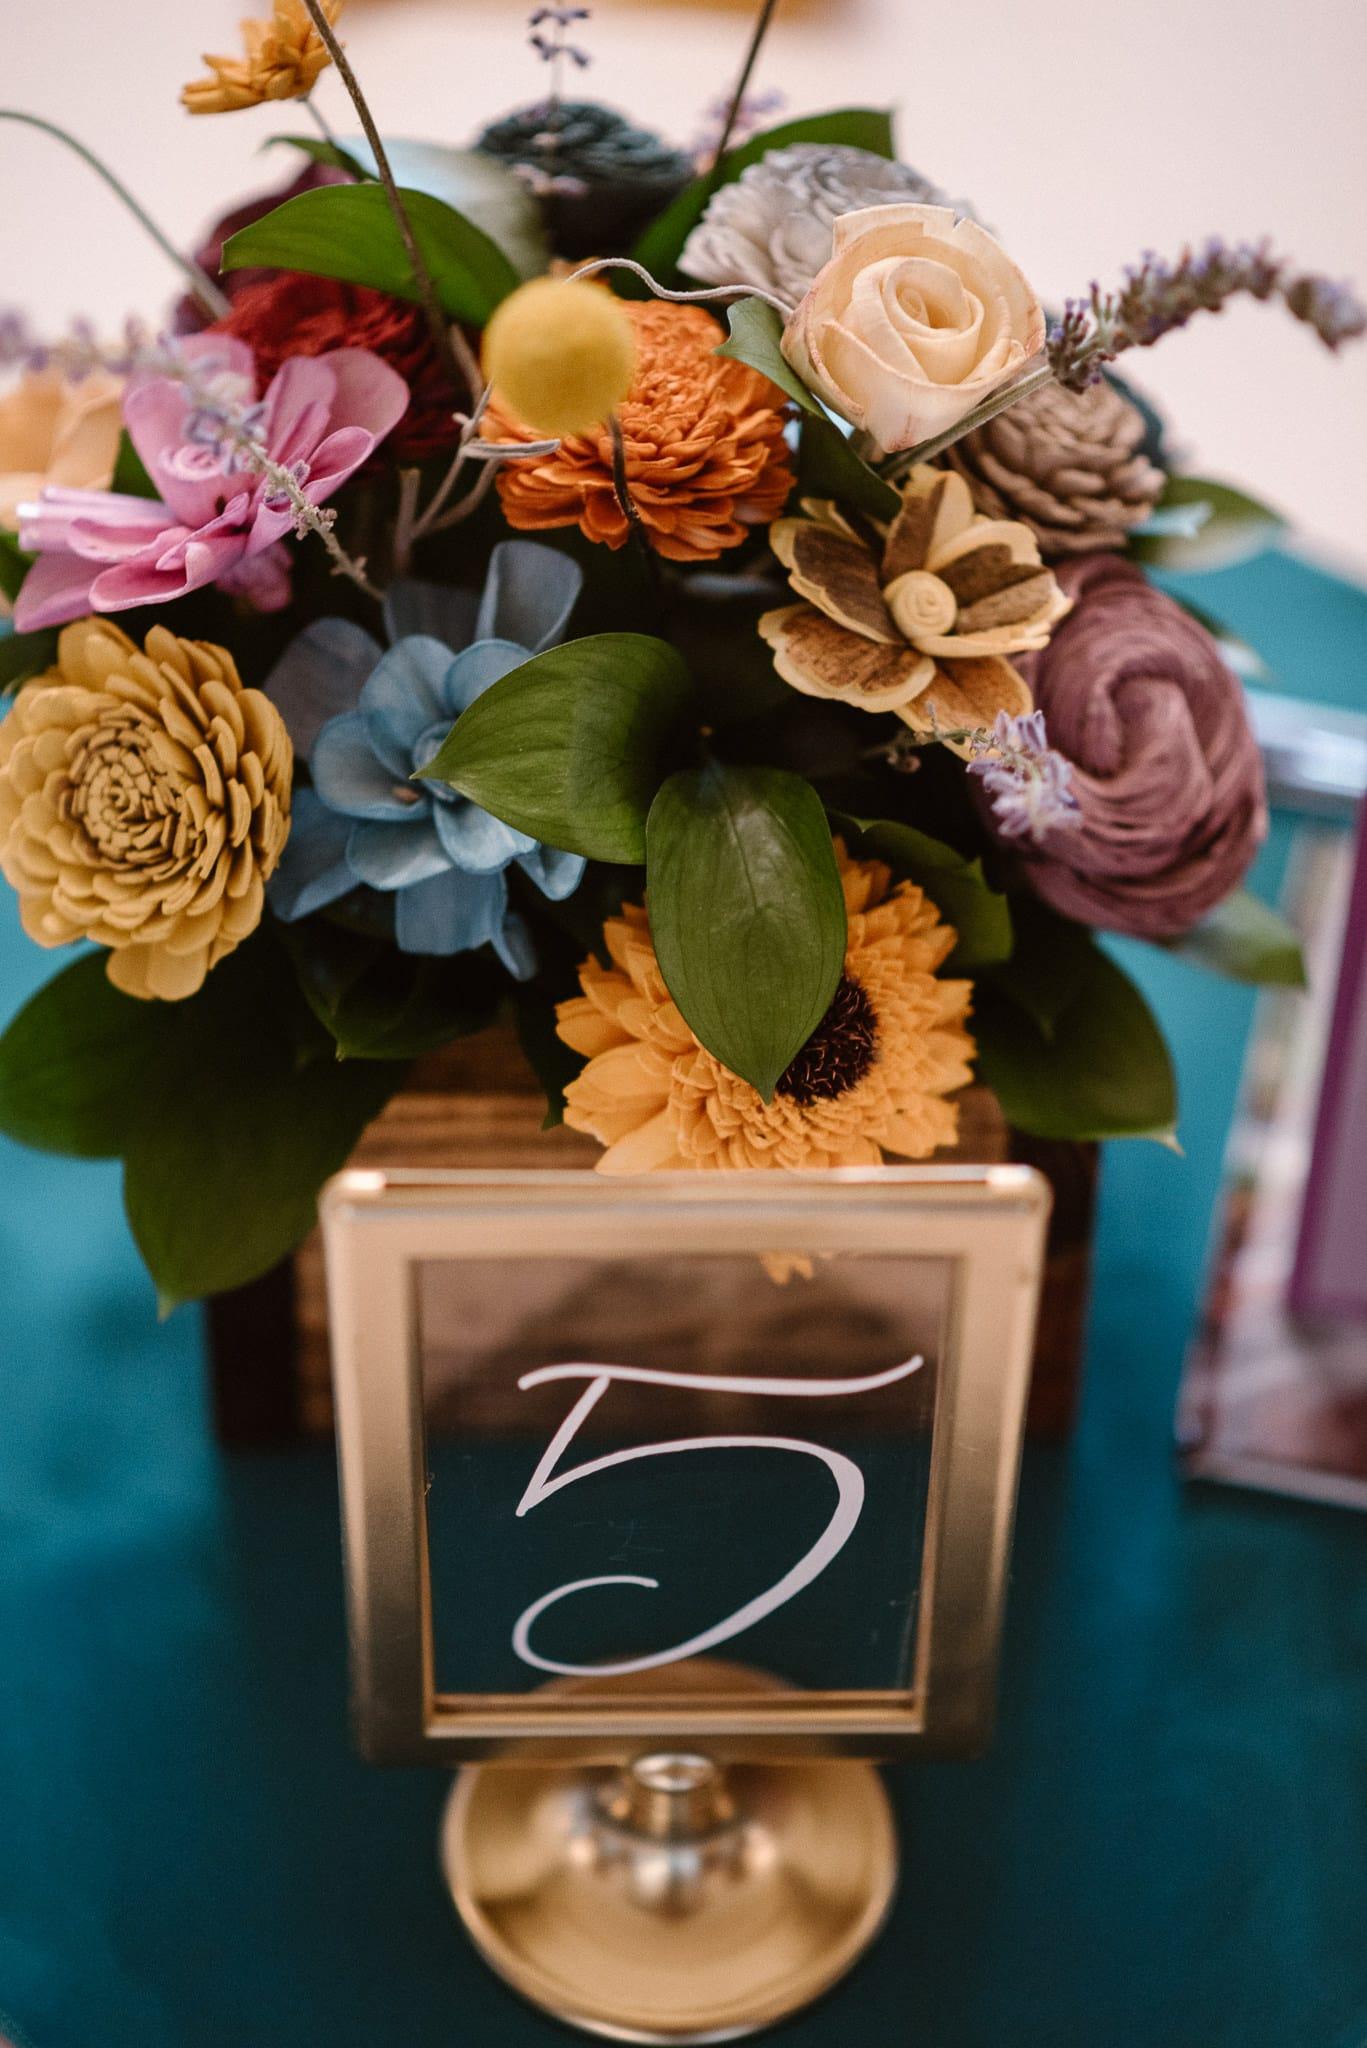 Grant Humphreys Mansion Wedding Photographer, Denver wedding photographer, Colorado wedding photographer, reception venue, wedding reception decor, table numbers